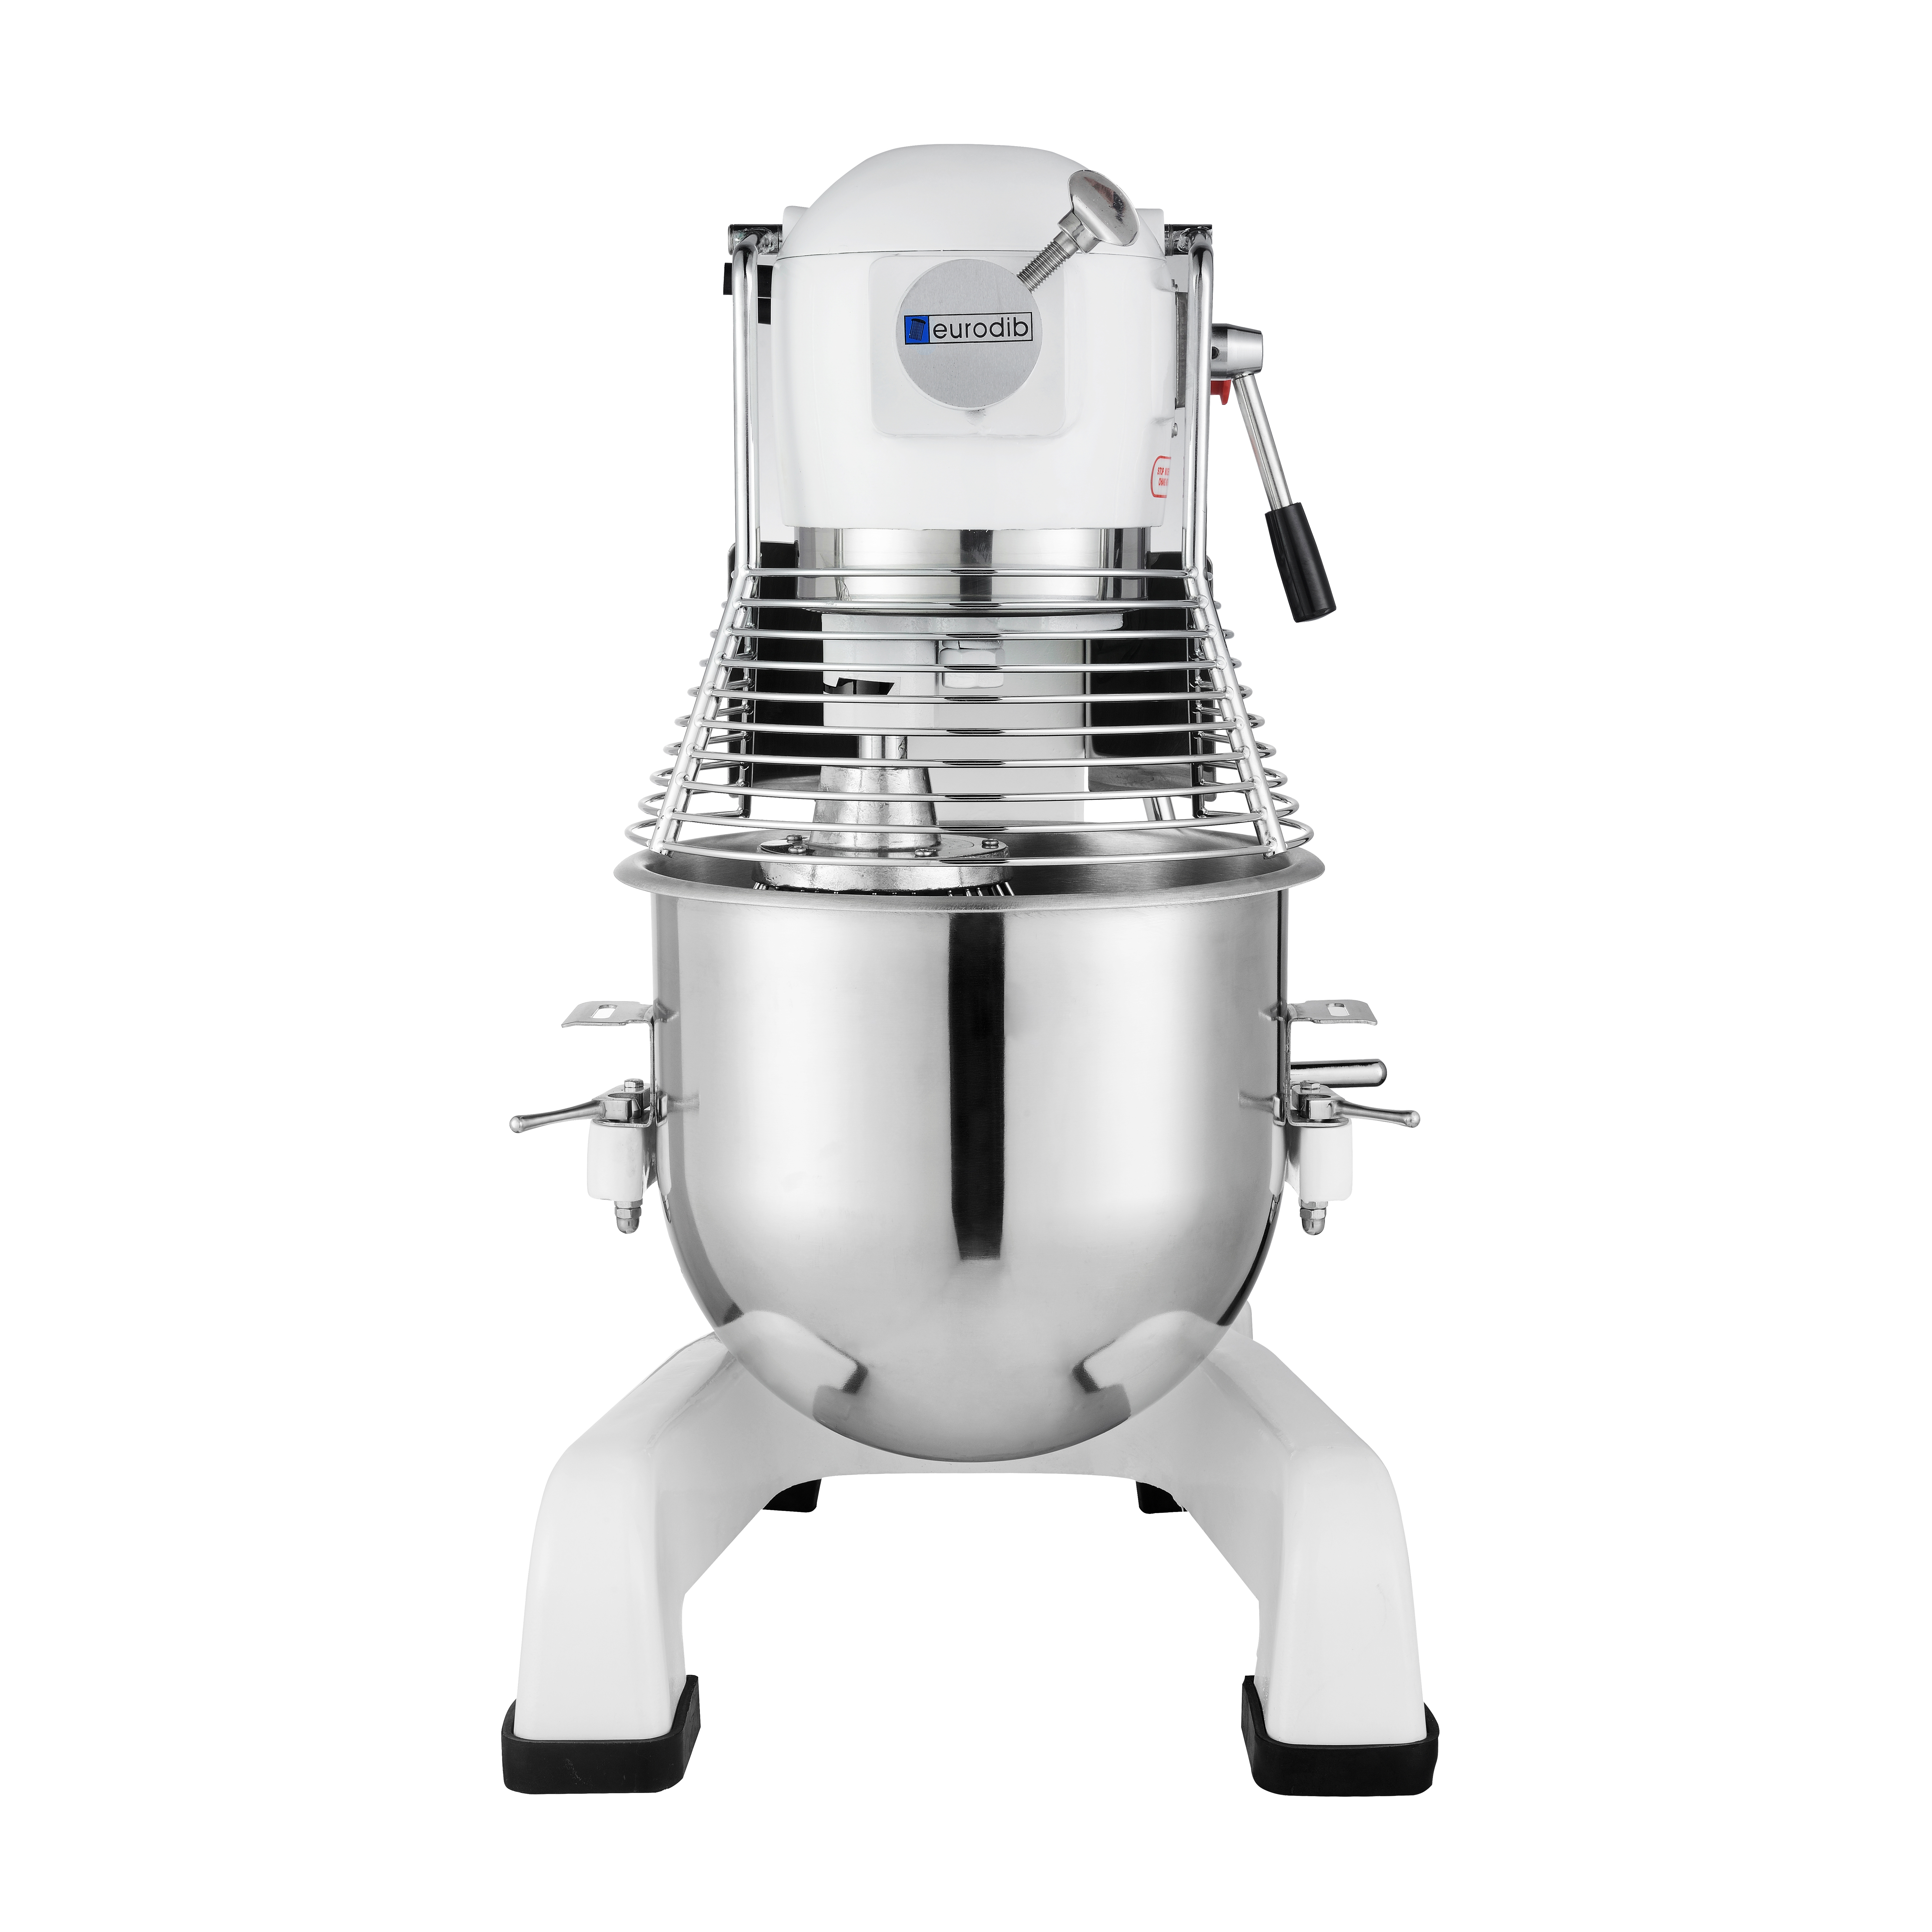 Eurodib USA M20ETL mixer, planetary